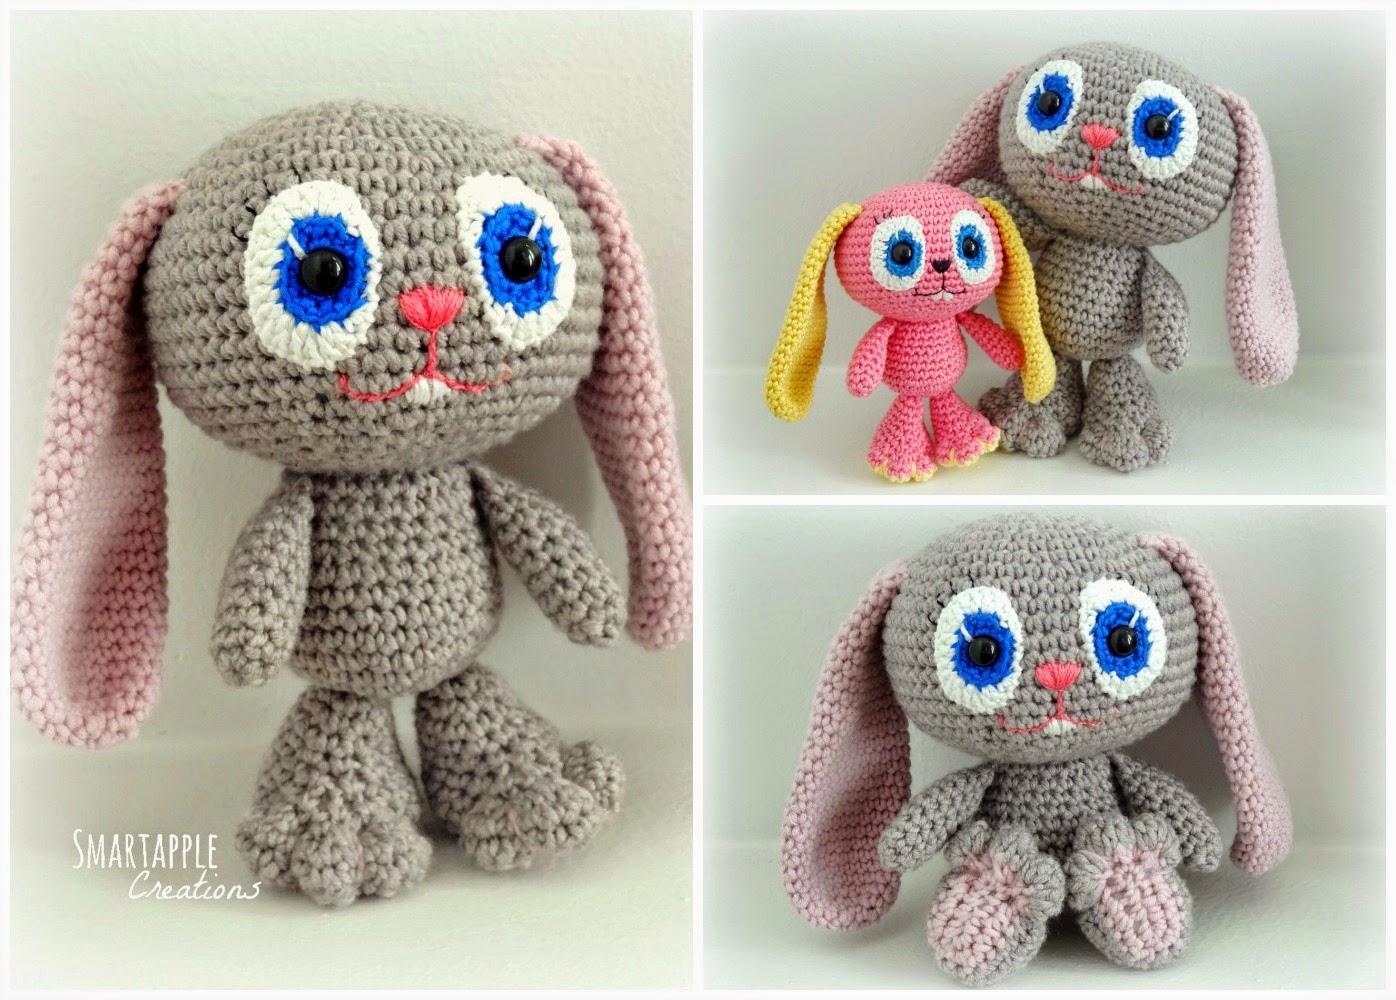 Amigurumi Janes : Smartapple Creations - amigurumi and crochet: Amigurumi ...